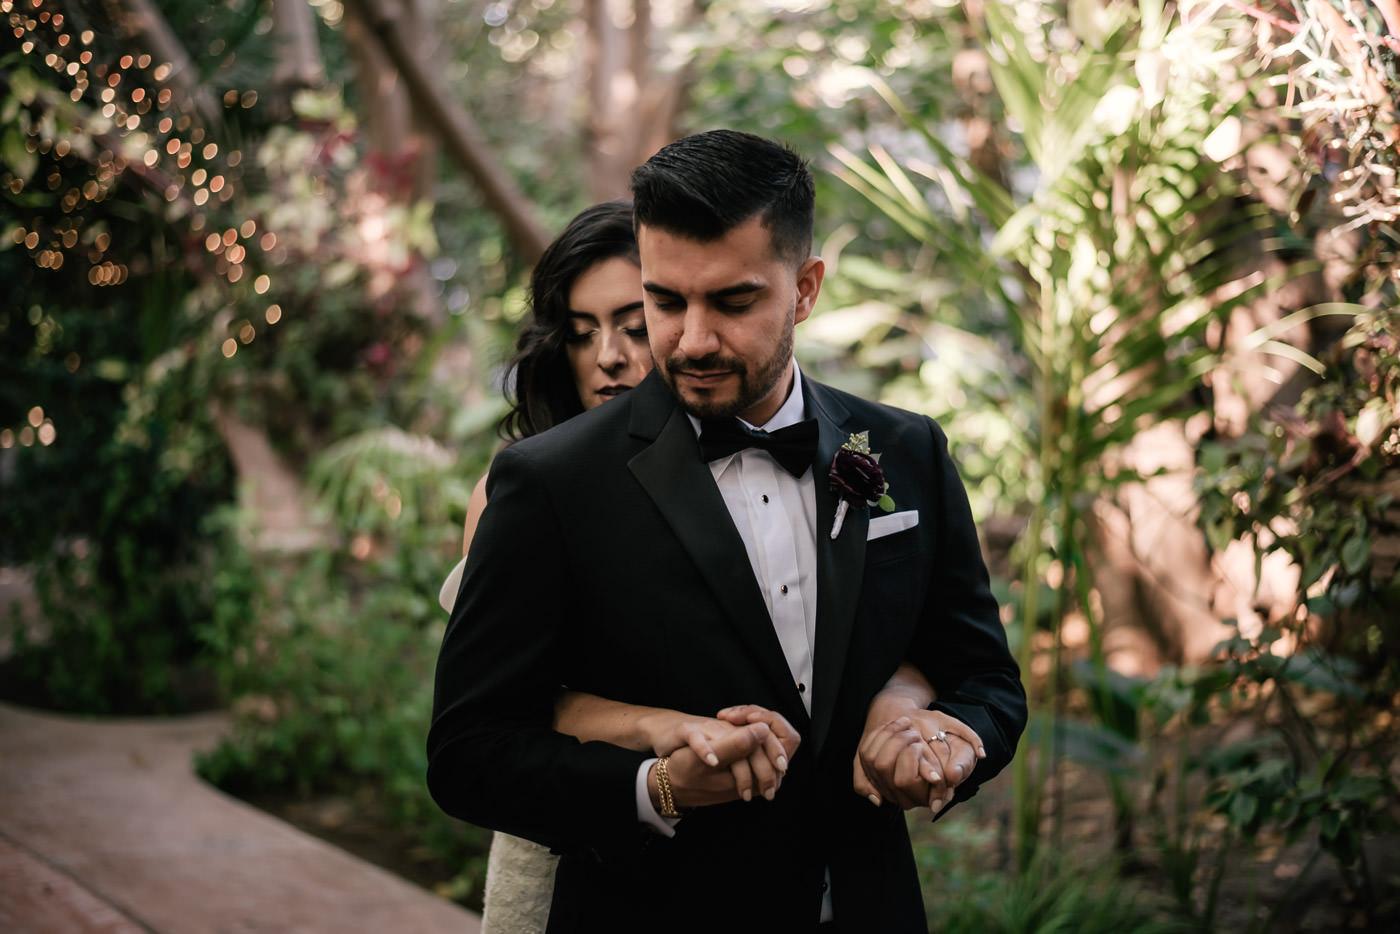 eden-gardens-wedding-photographer-romantic-27.jpg